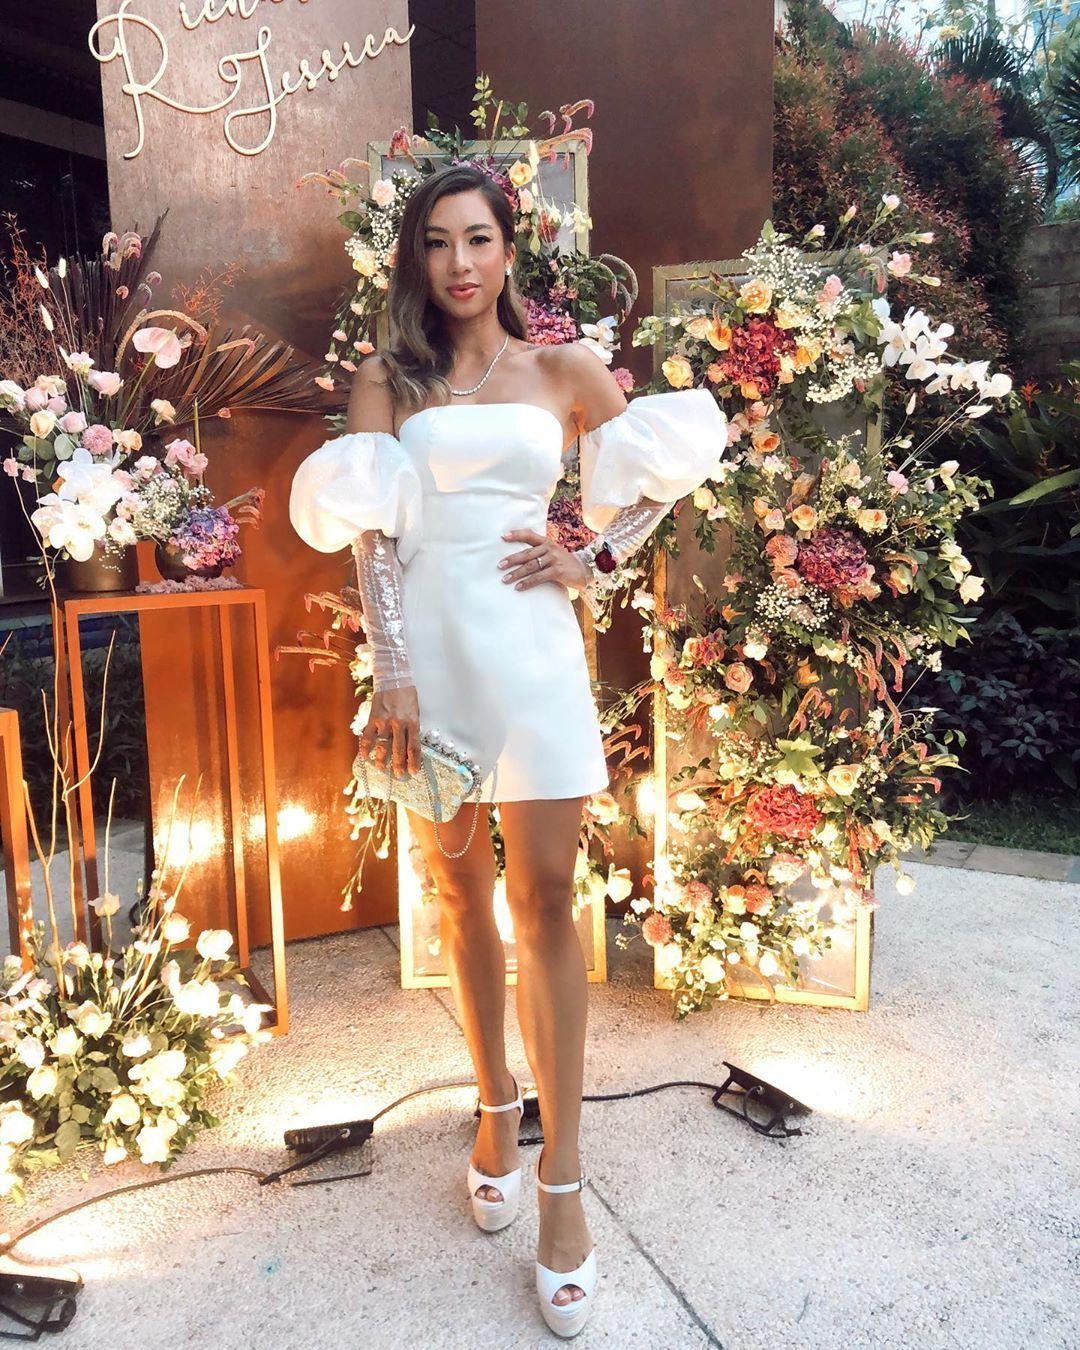 Potret Busana Glamor Girl Squad di Acara Tunangan Jessica Iskandar